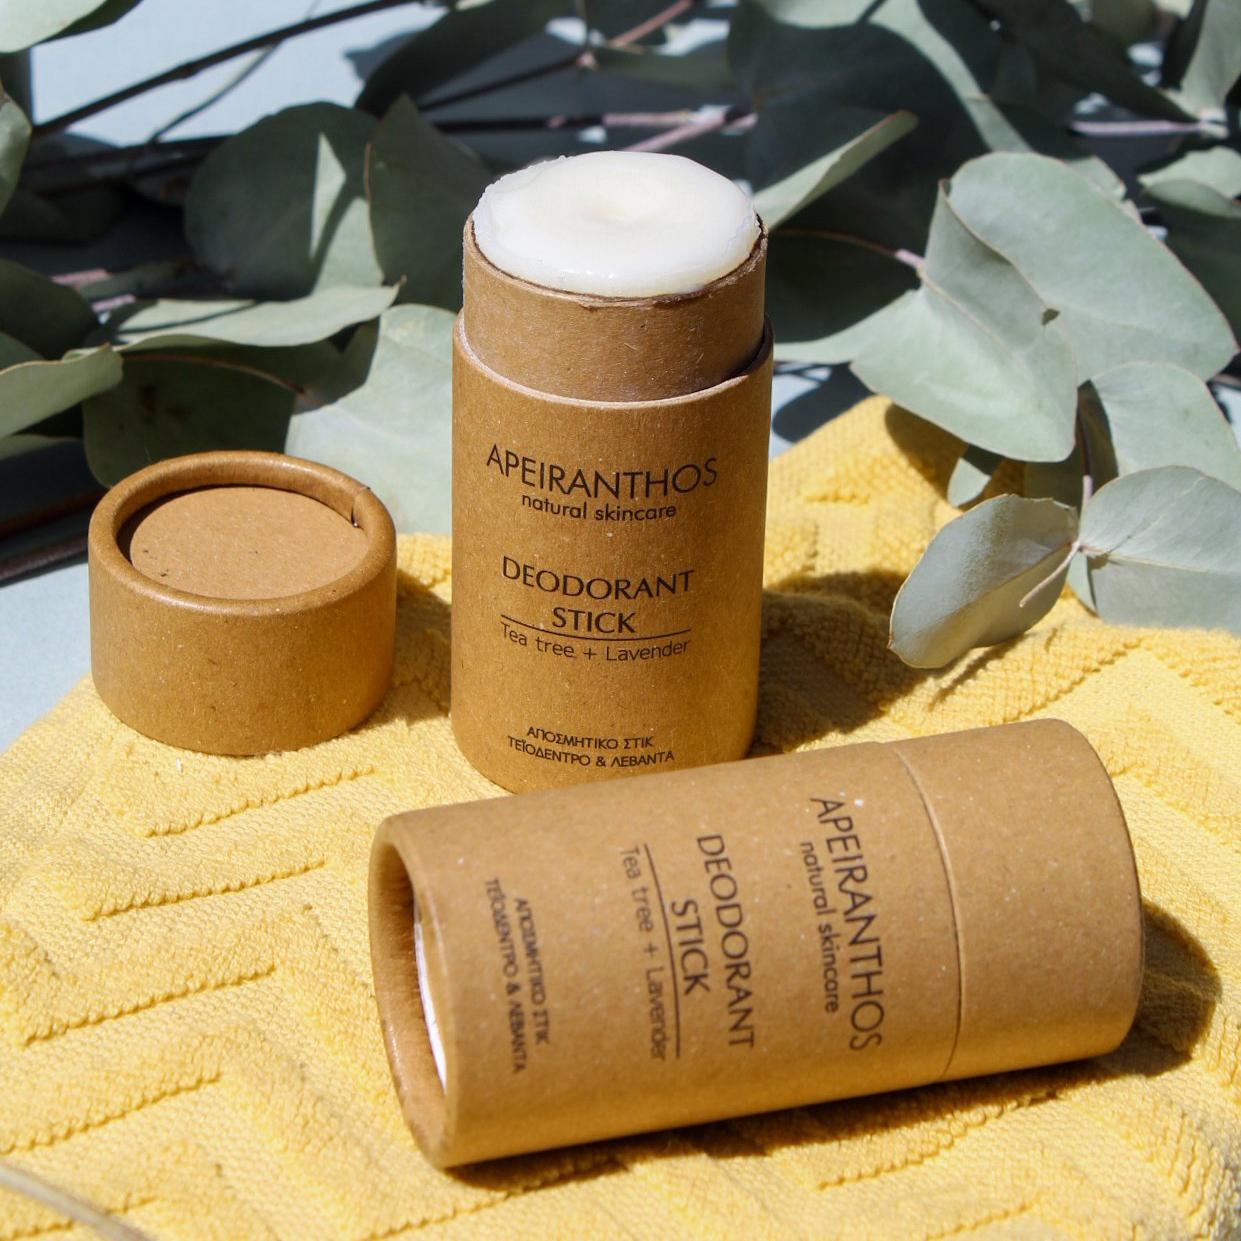 Apeiranthos Deodorant stick | Tea tree + Lavender 30gr